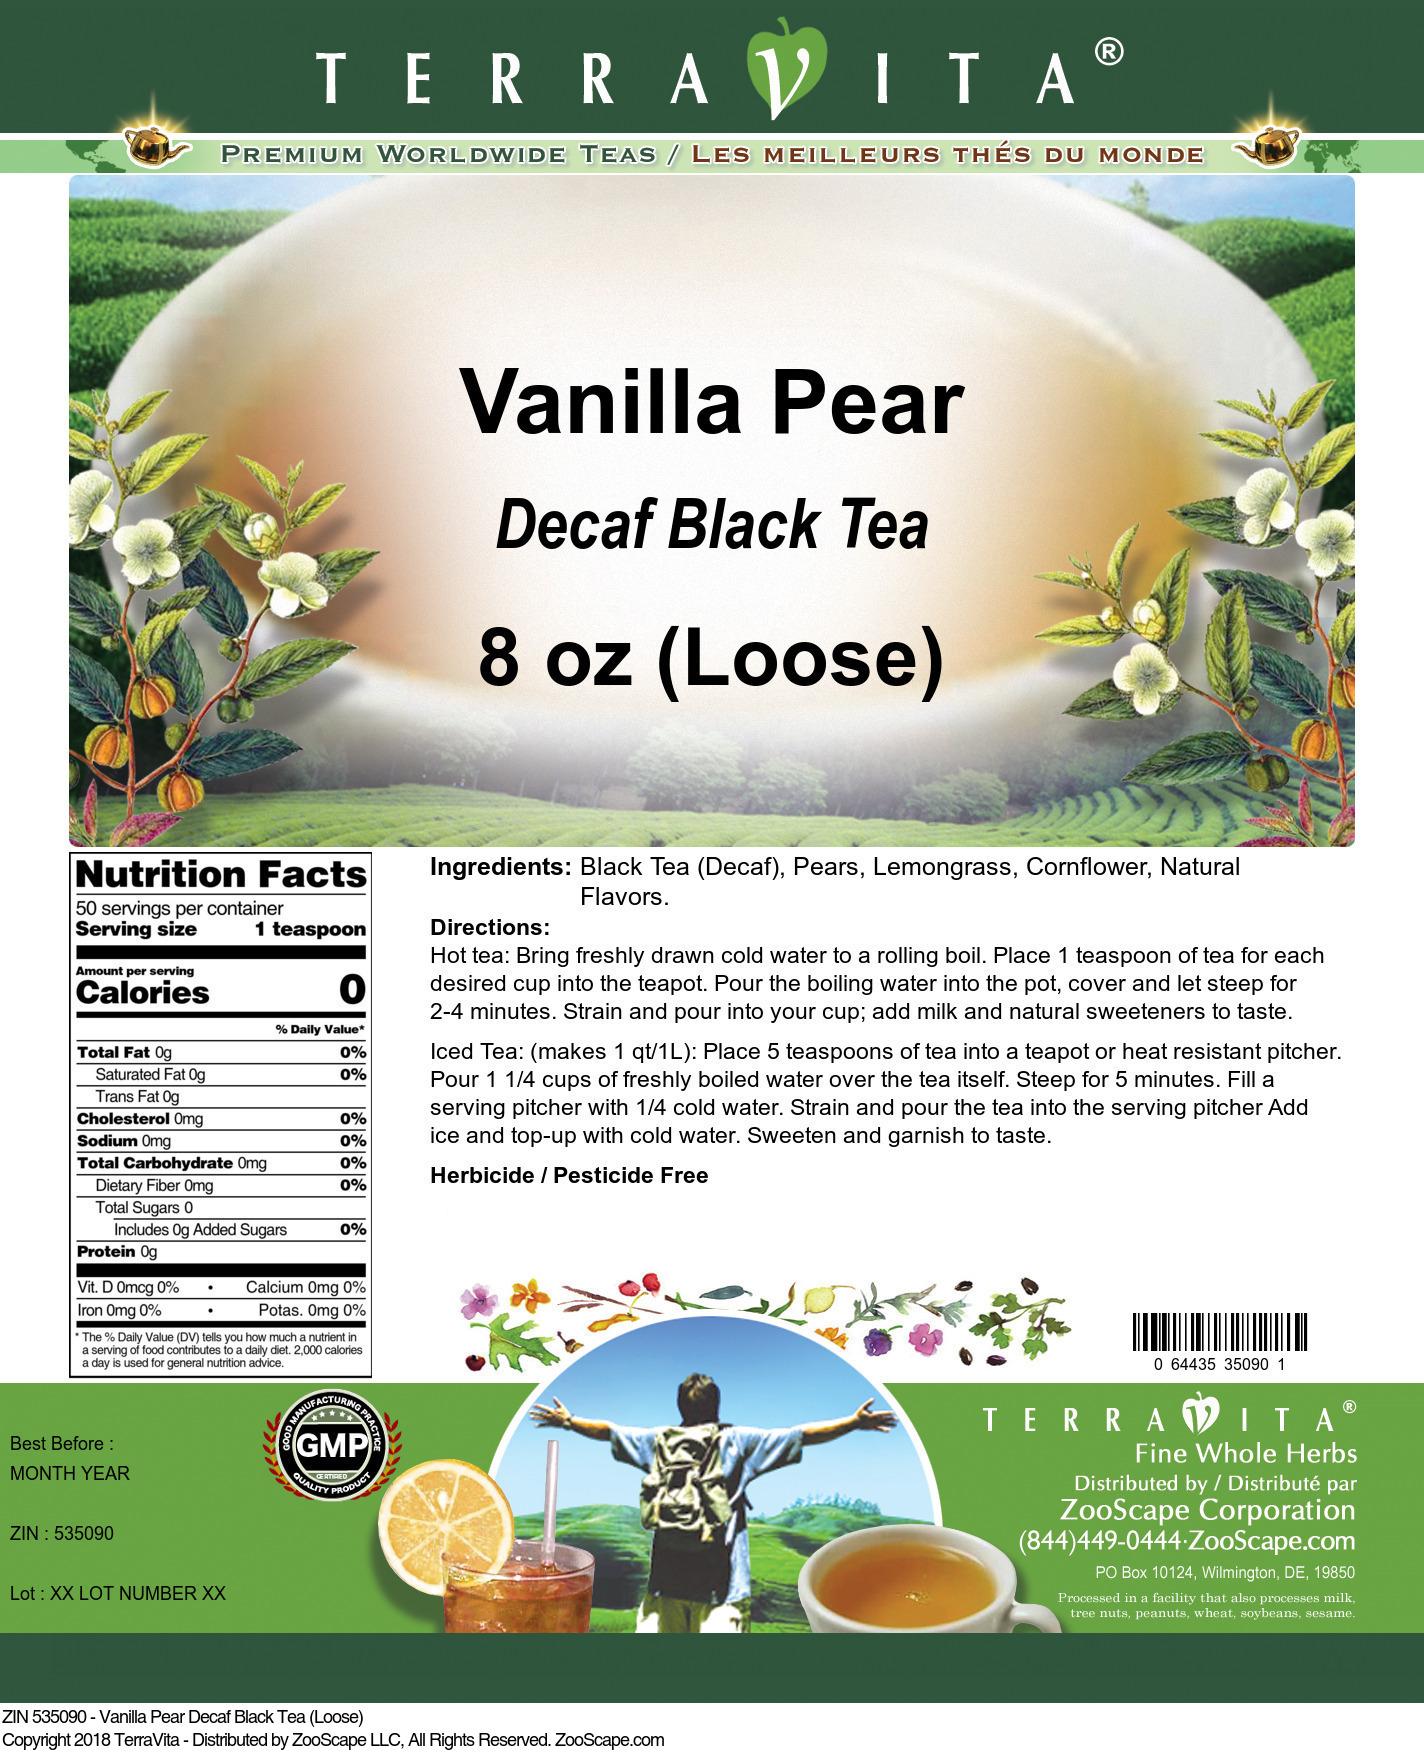 Vanilla Pear Decaf Black Tea